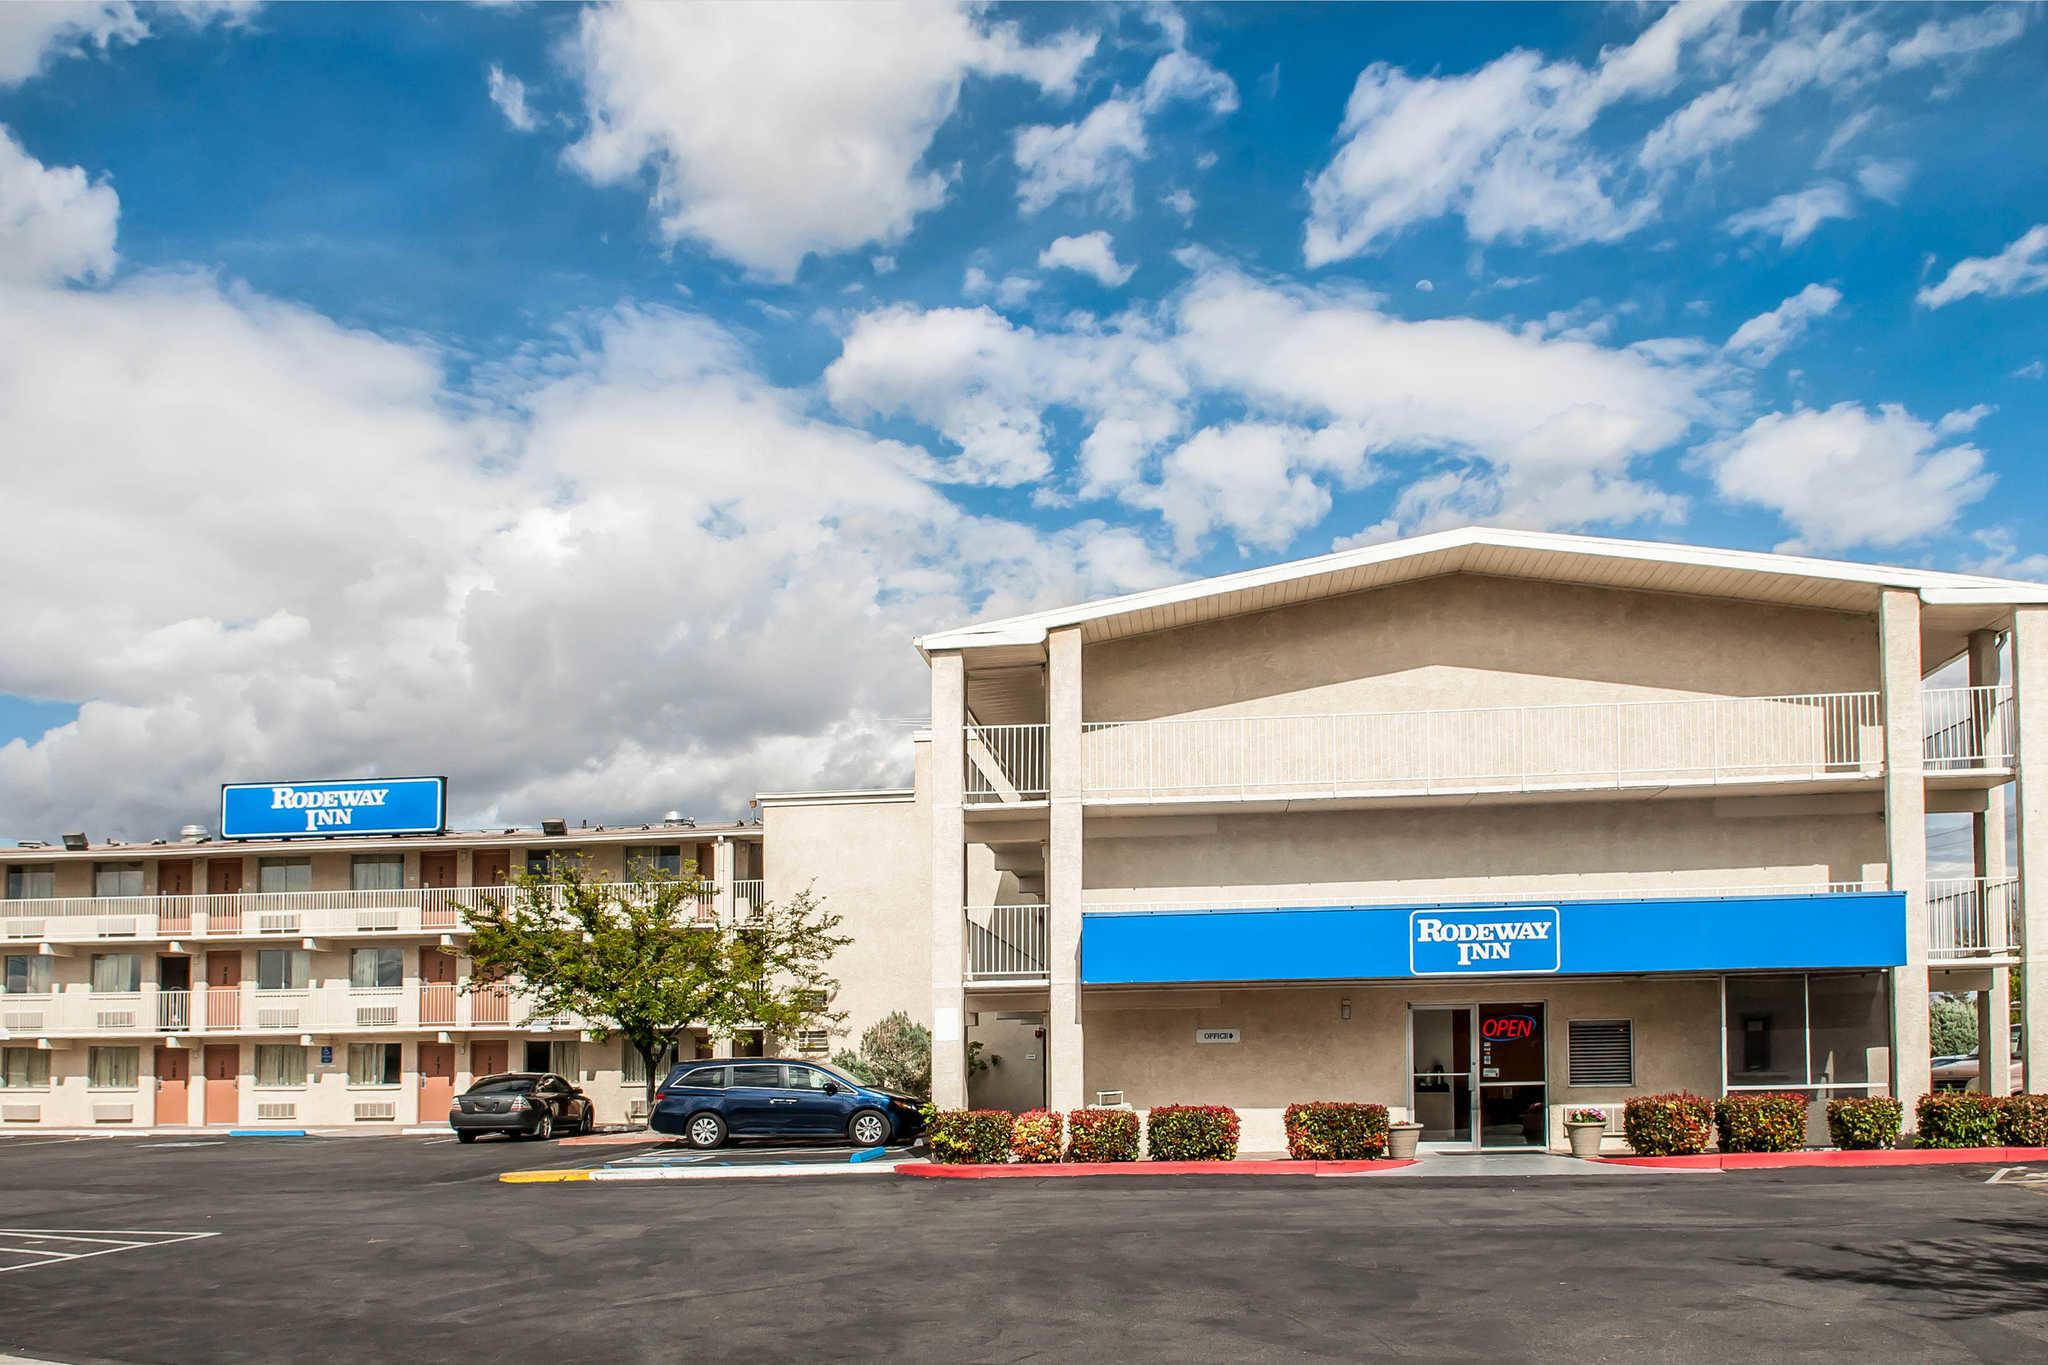 Hotels Near Convention Center Albuquerque Nm